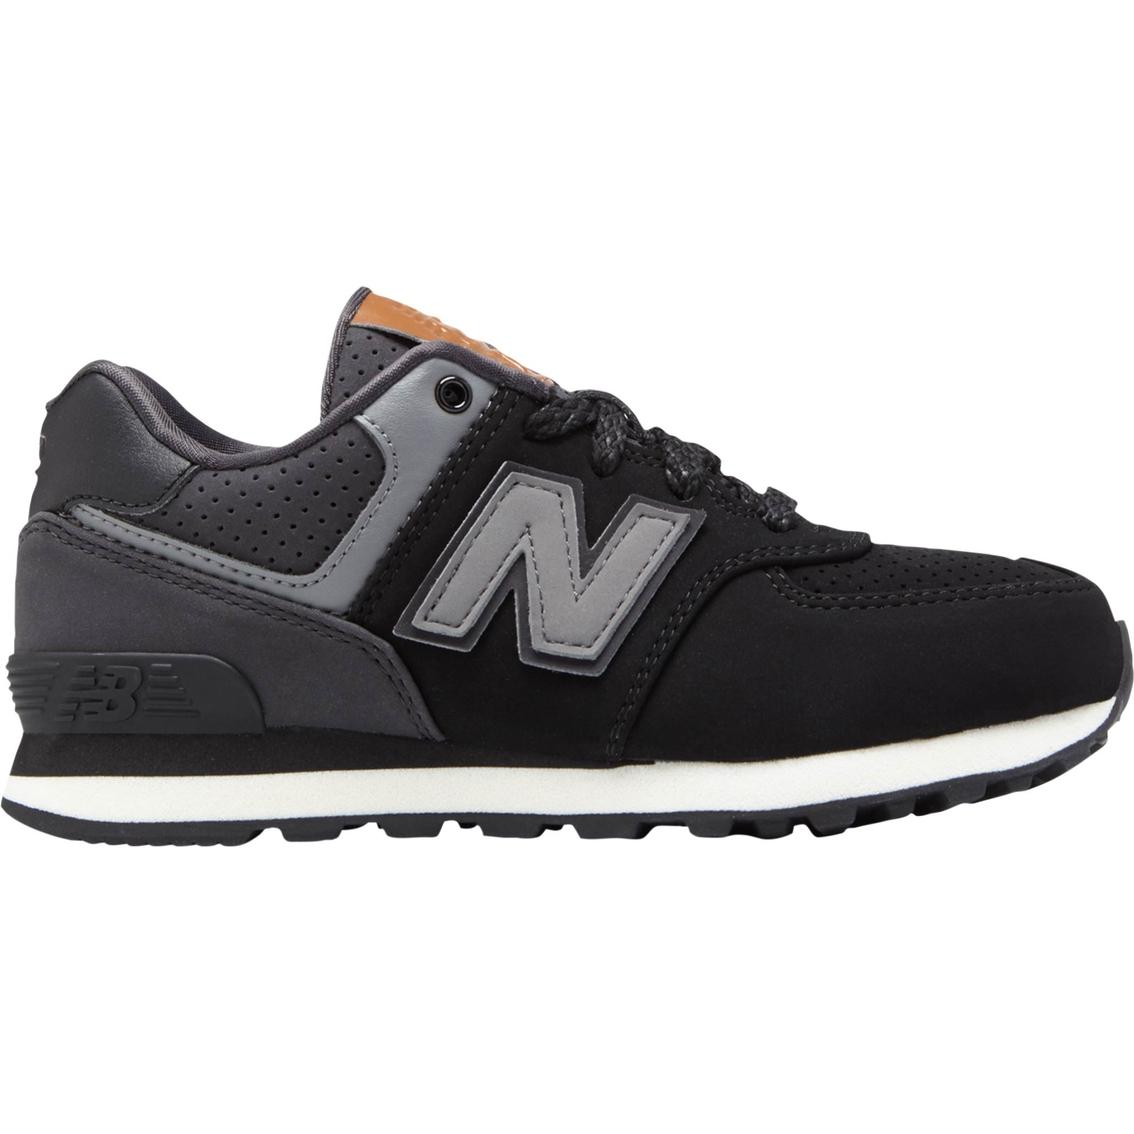 New Balance KL574YAP Running Shoes